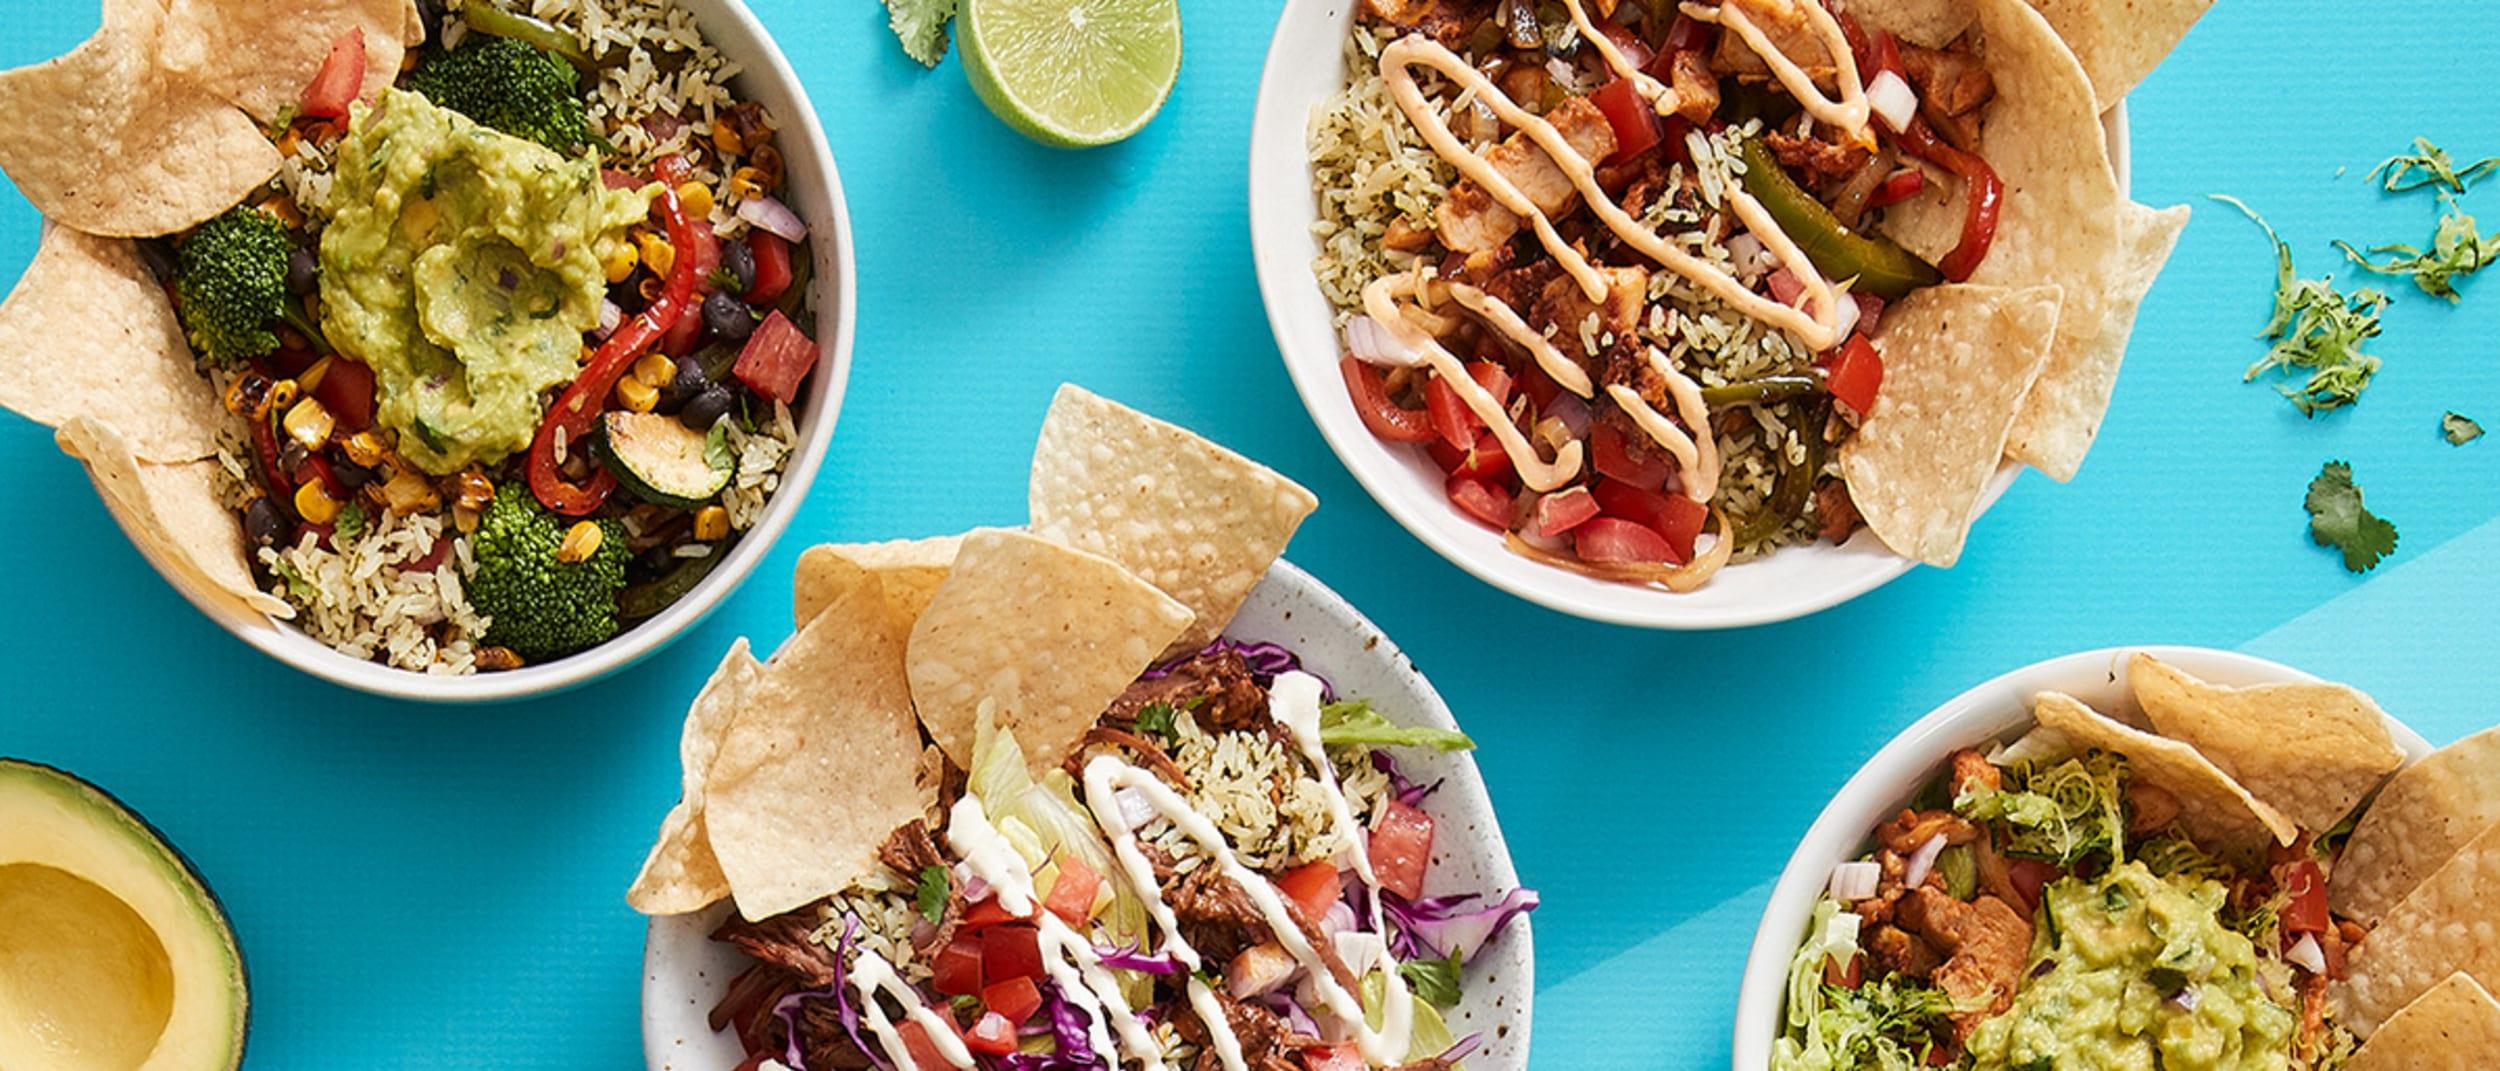 Salsas Fresh Mex $9.95 bowls